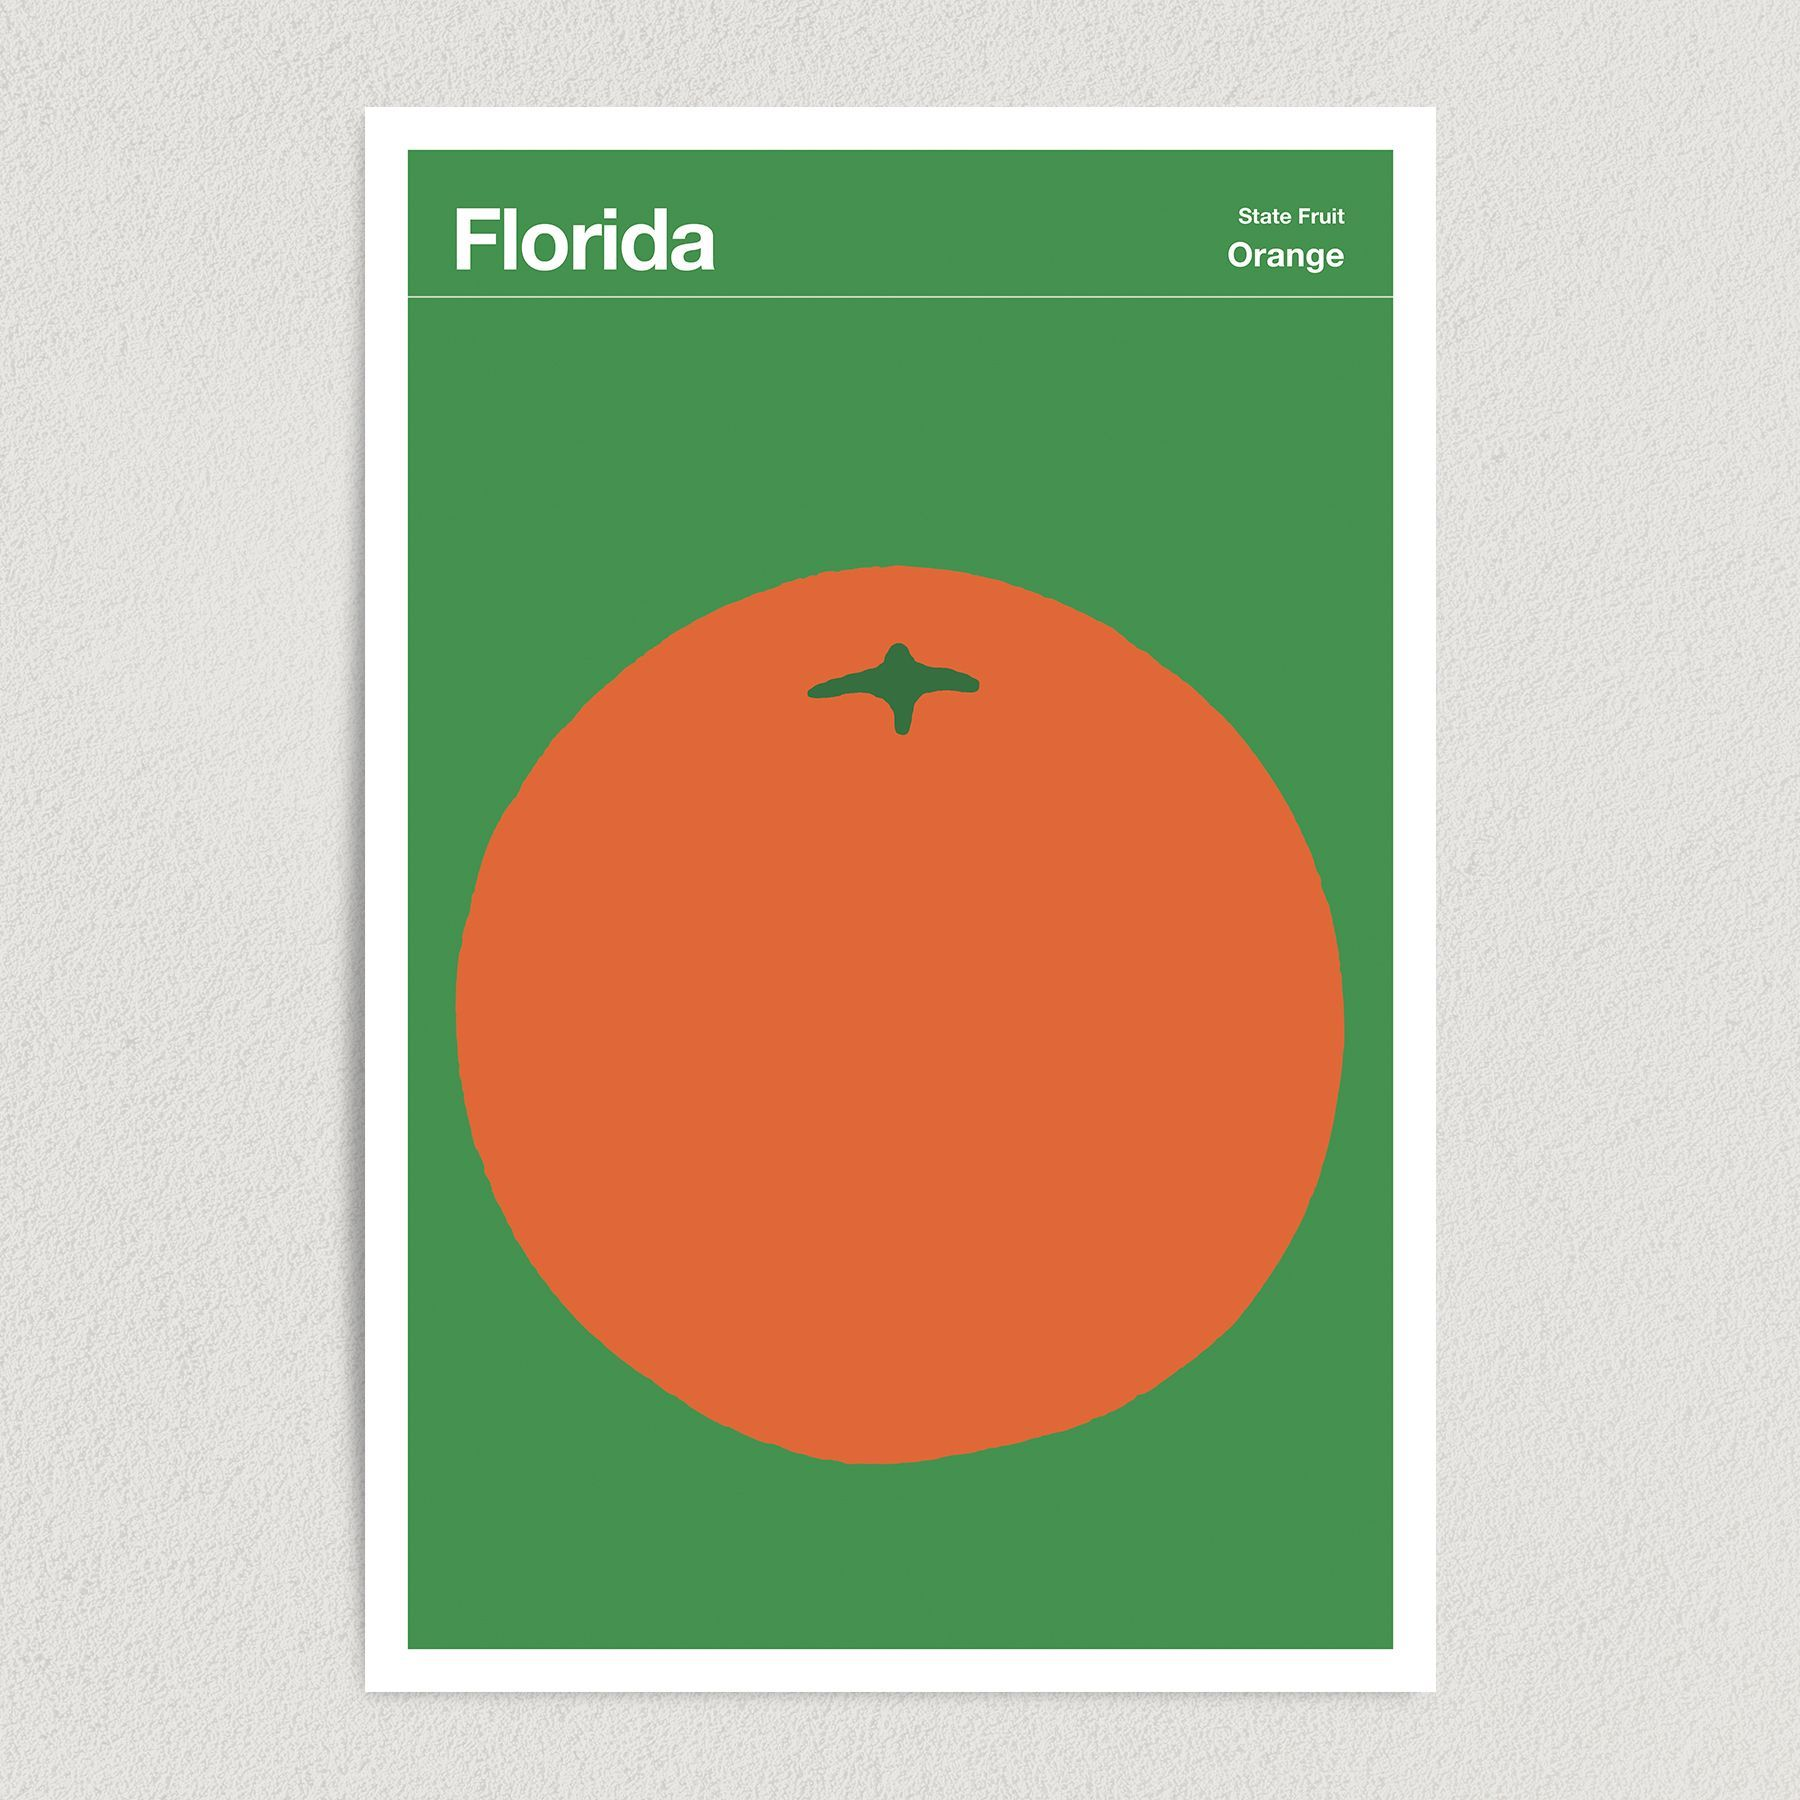 Florida State Fruit Orange Illustration Art Print Poster 12″ x 18″ Wall Art T2134